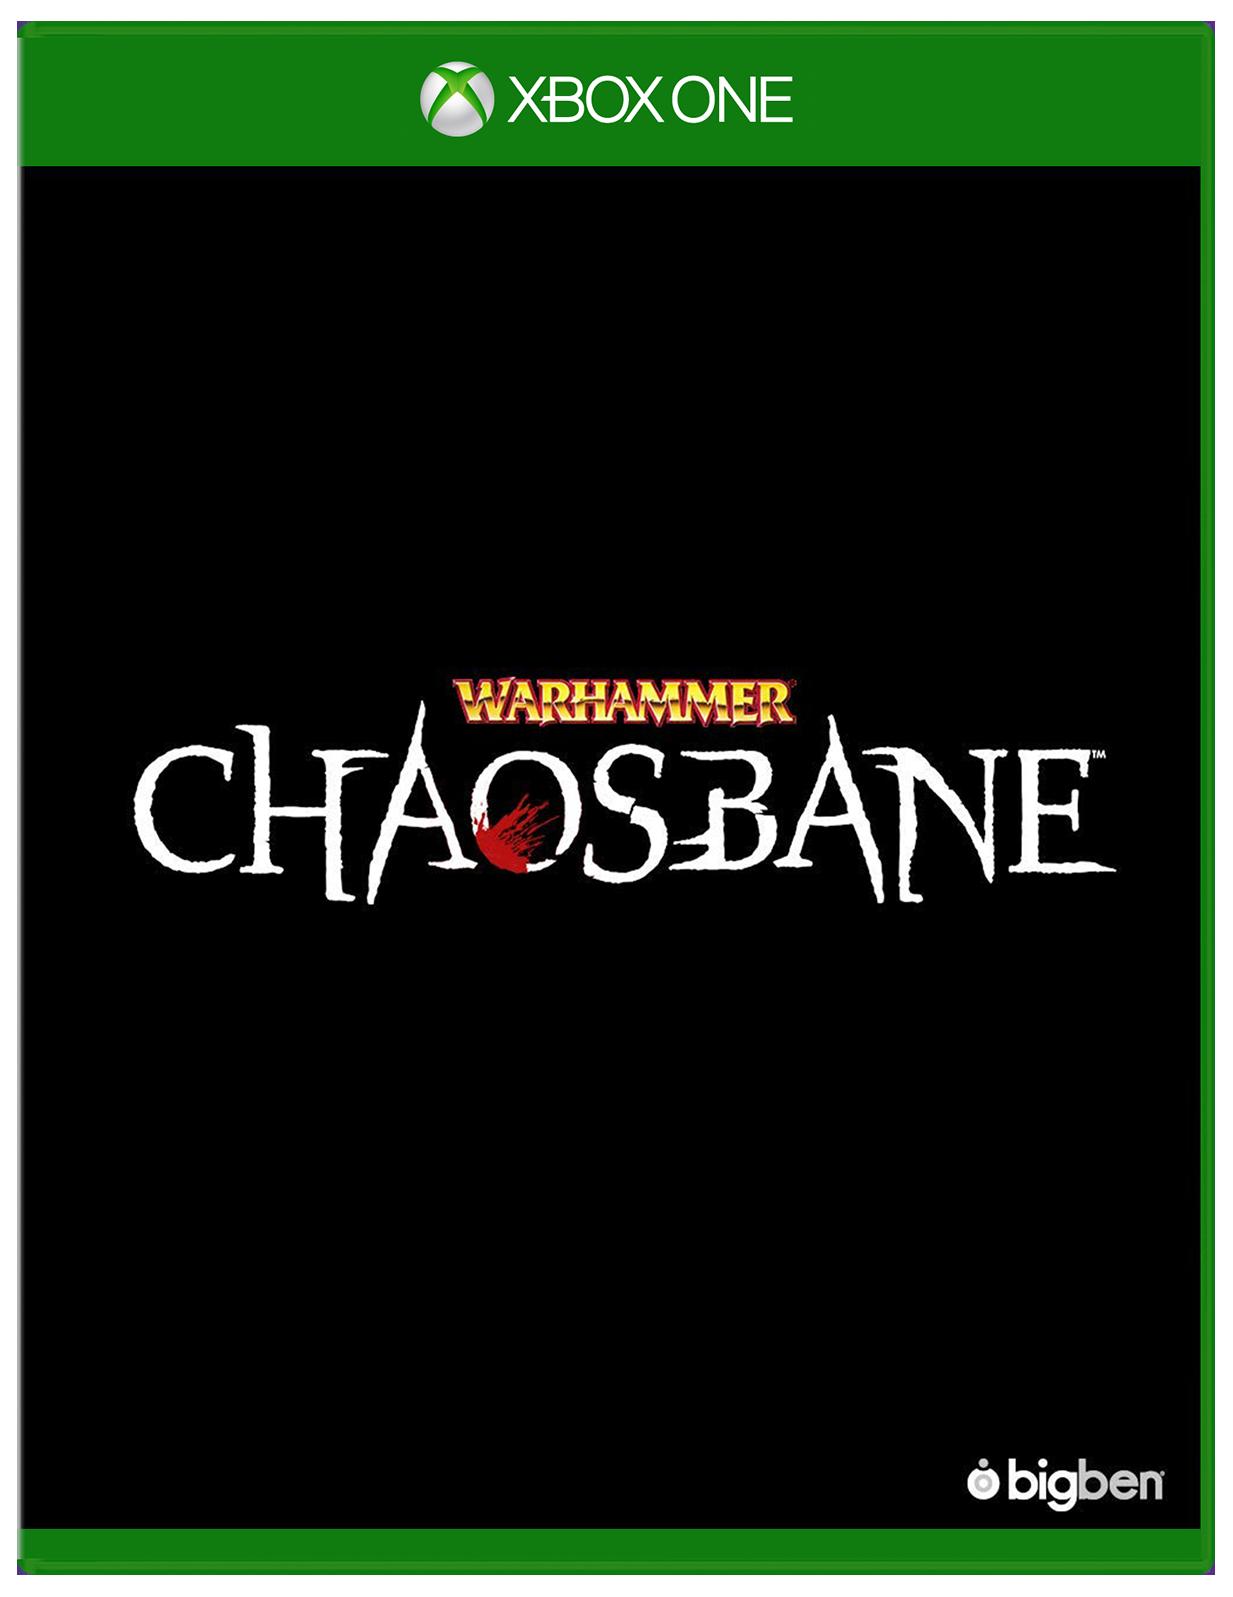 Warhammer Chaosbane XB1